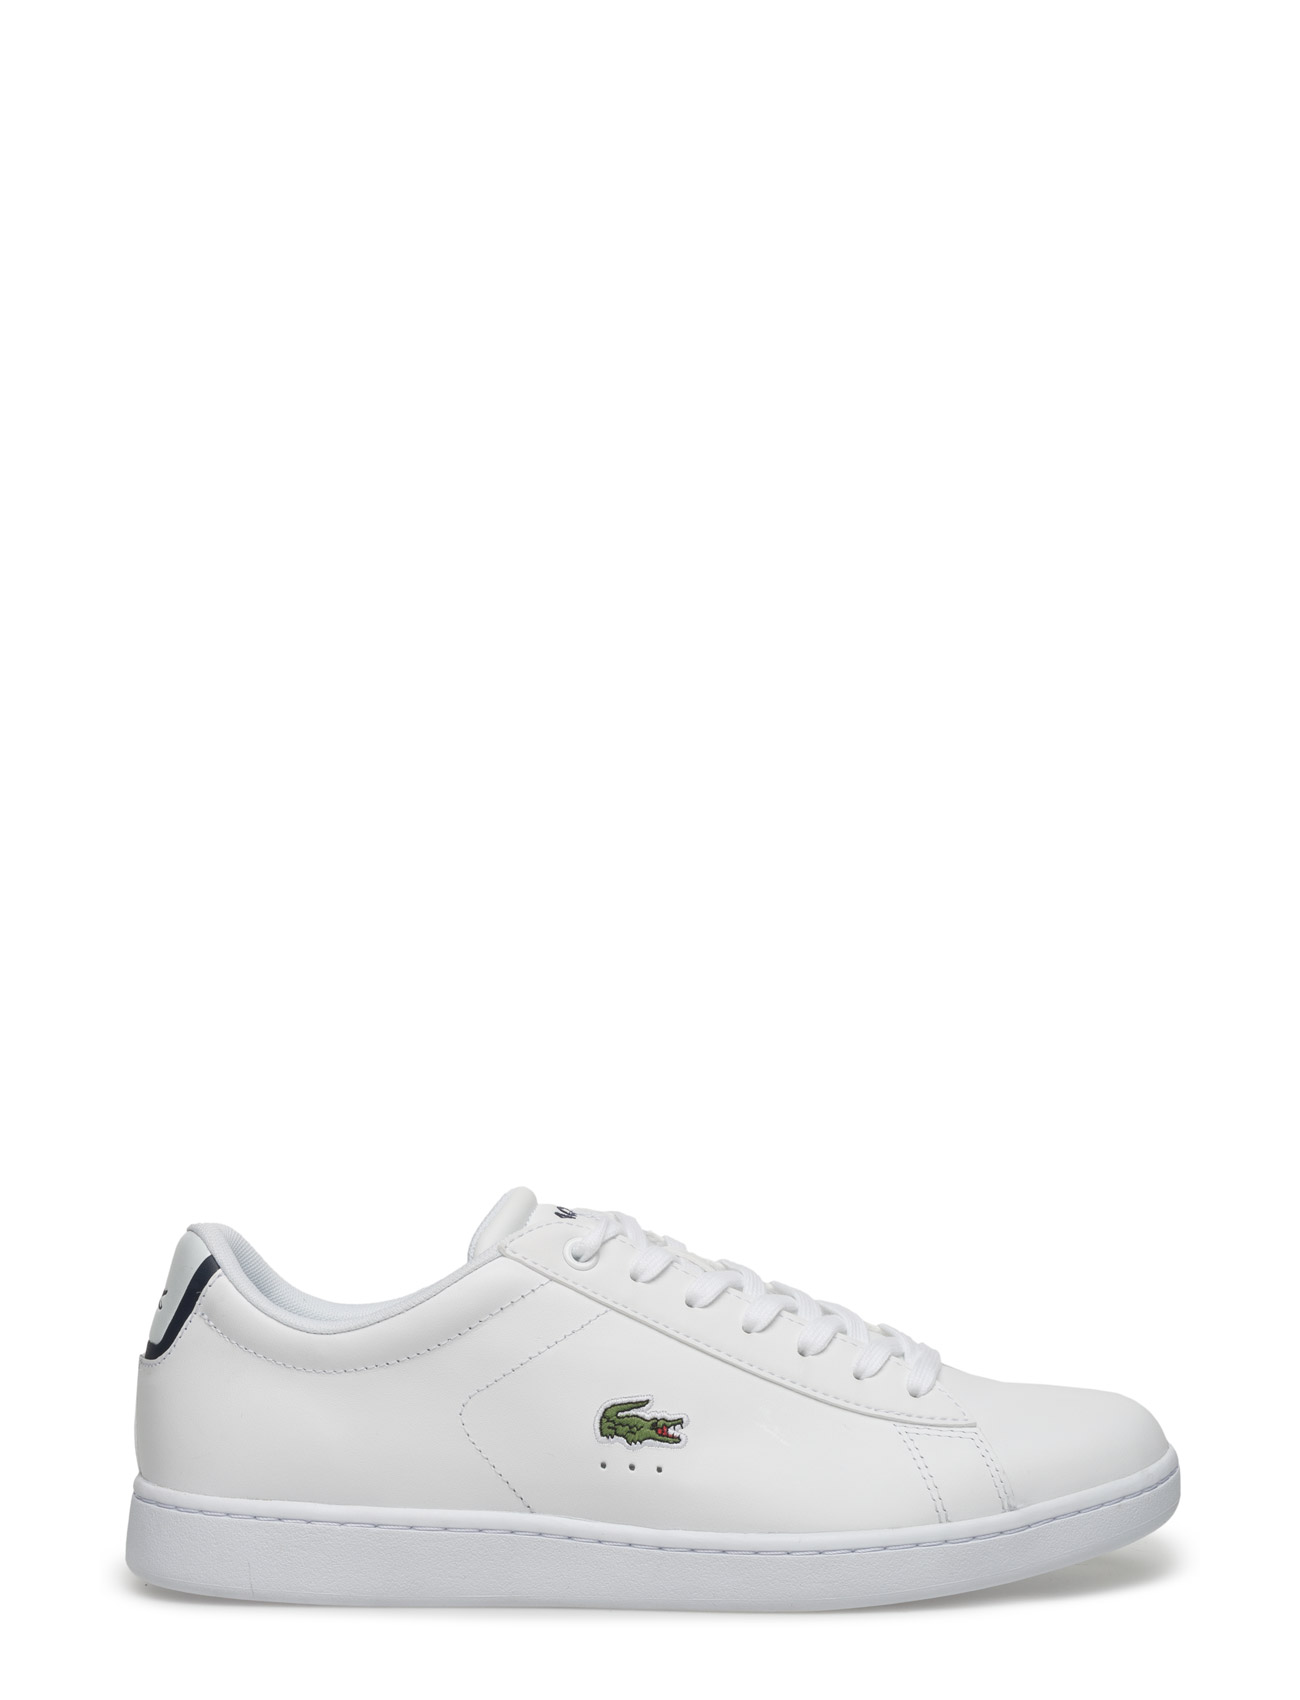 Carnaby Evo Bl 1 Lacoste Shoes Sneakers til Damer i